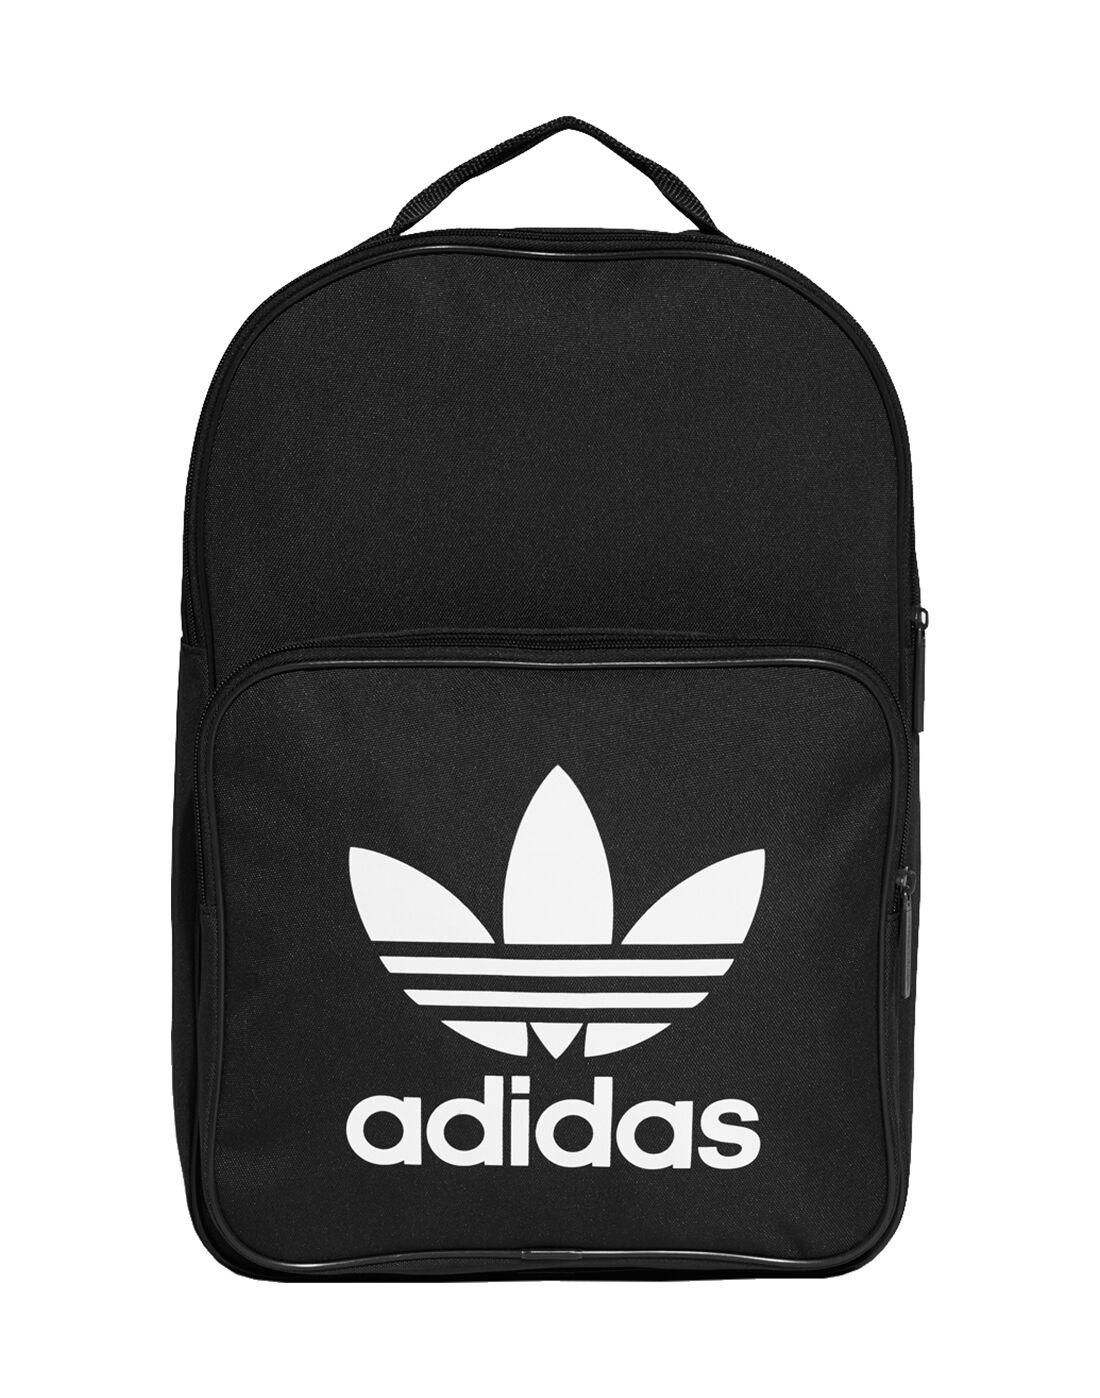 adidas Originals Classic Trefoil Backpack | JD Sports Ireland